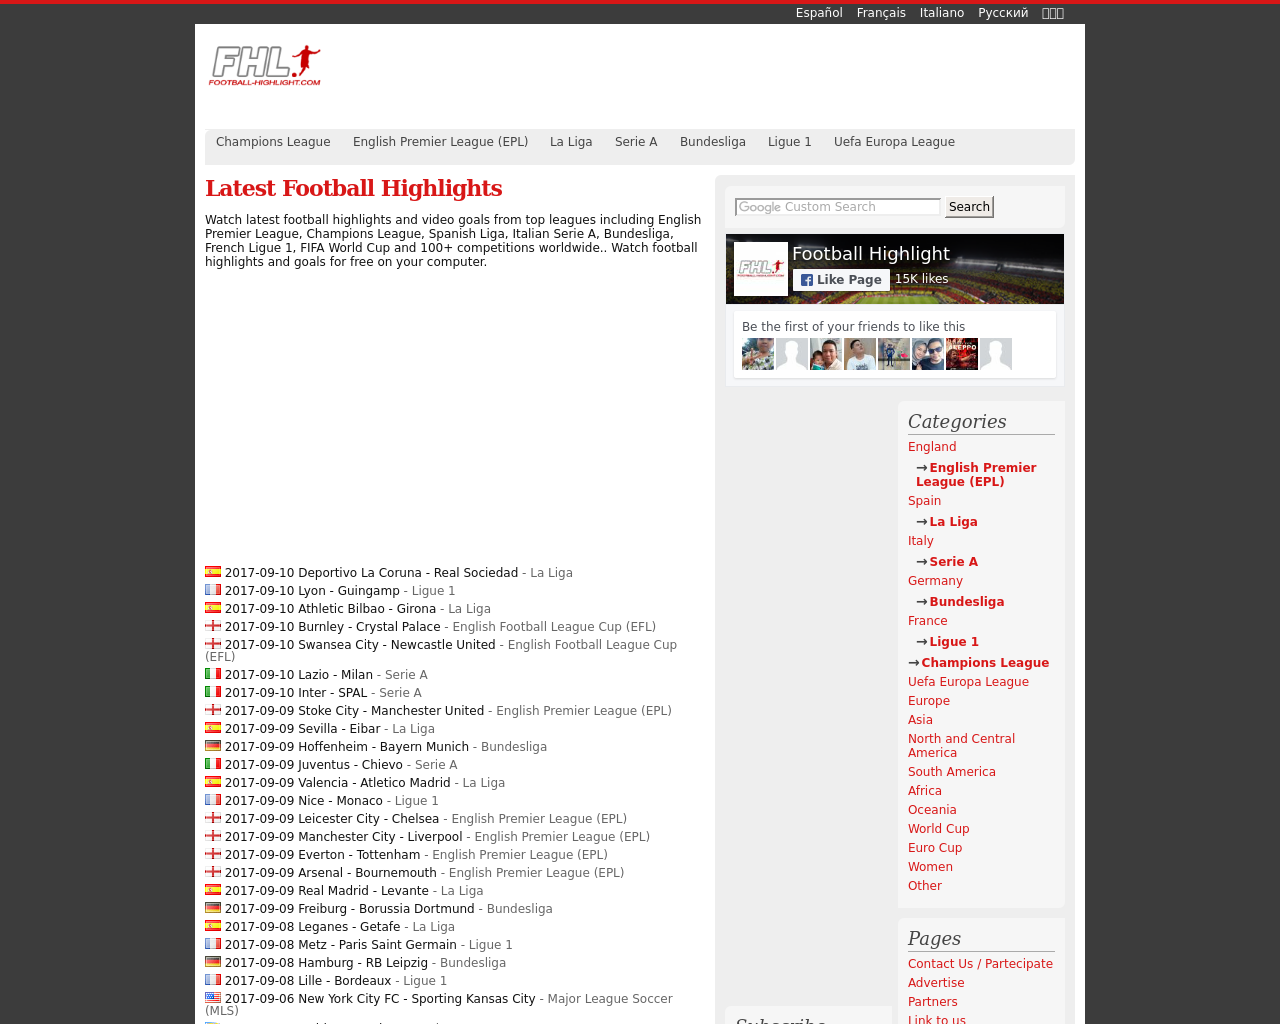 Footbal-Highlight-Advertising-Reviews-Pricing